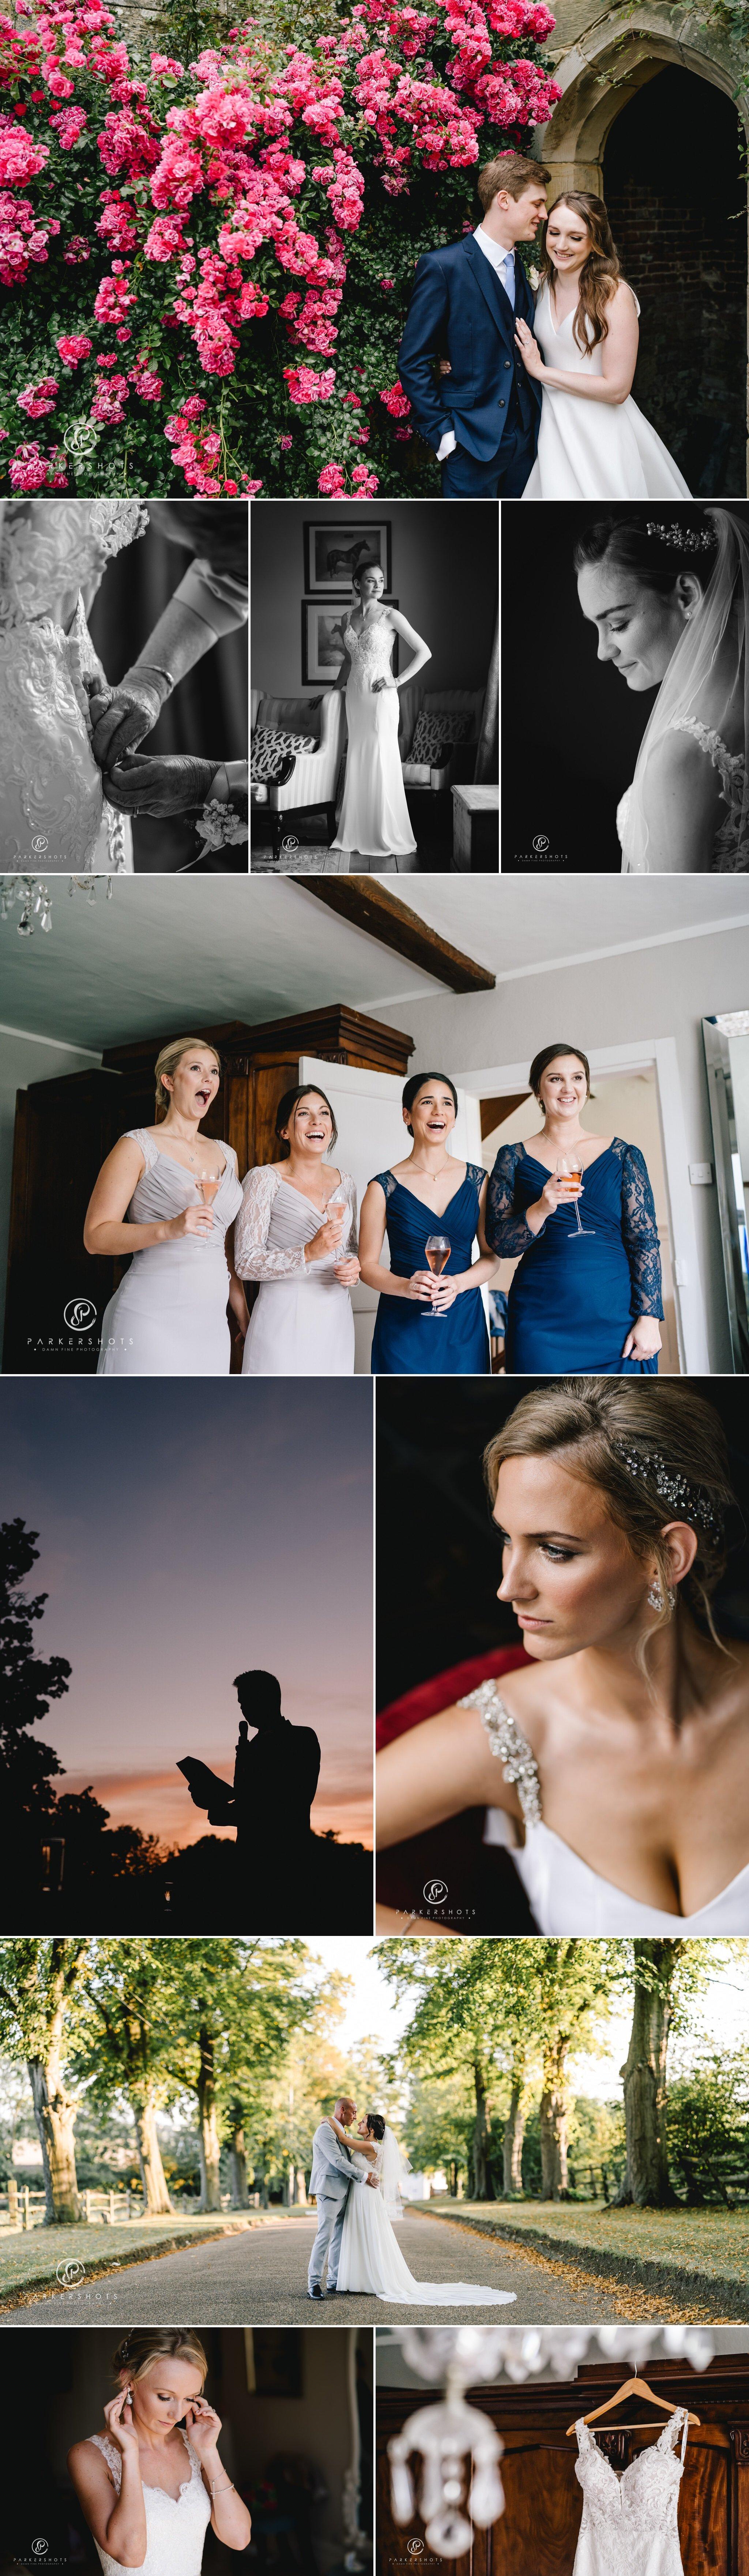 Best of Fine Art Wedding Photographers 2019